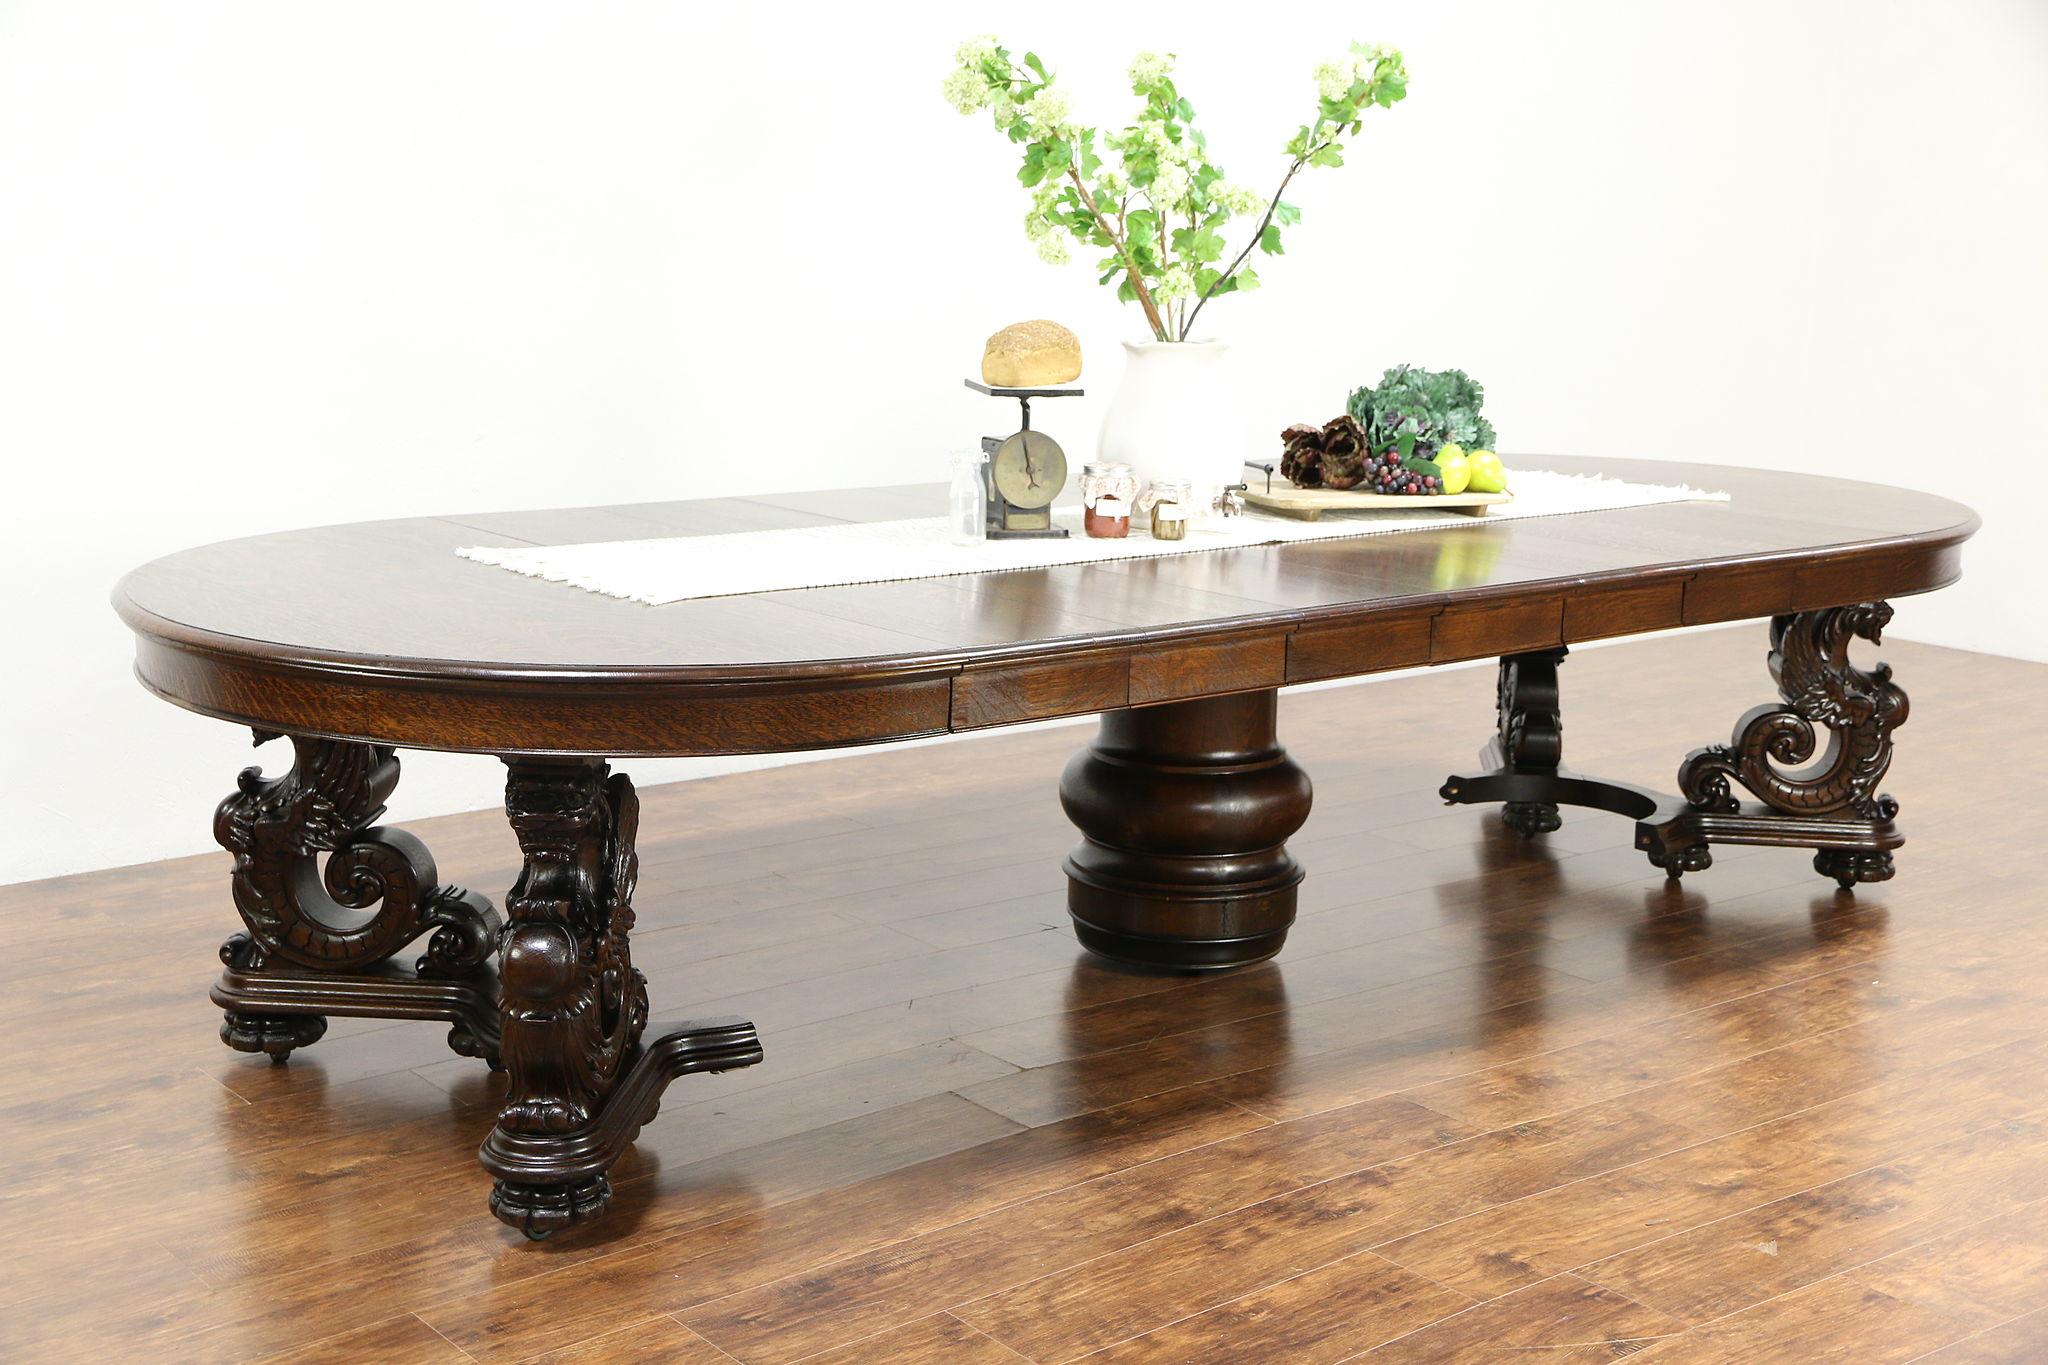 Oak Griffin Carved 1900 Antique Dining Table, 7 Leaves, Extends 12u0027 Berkey U0026